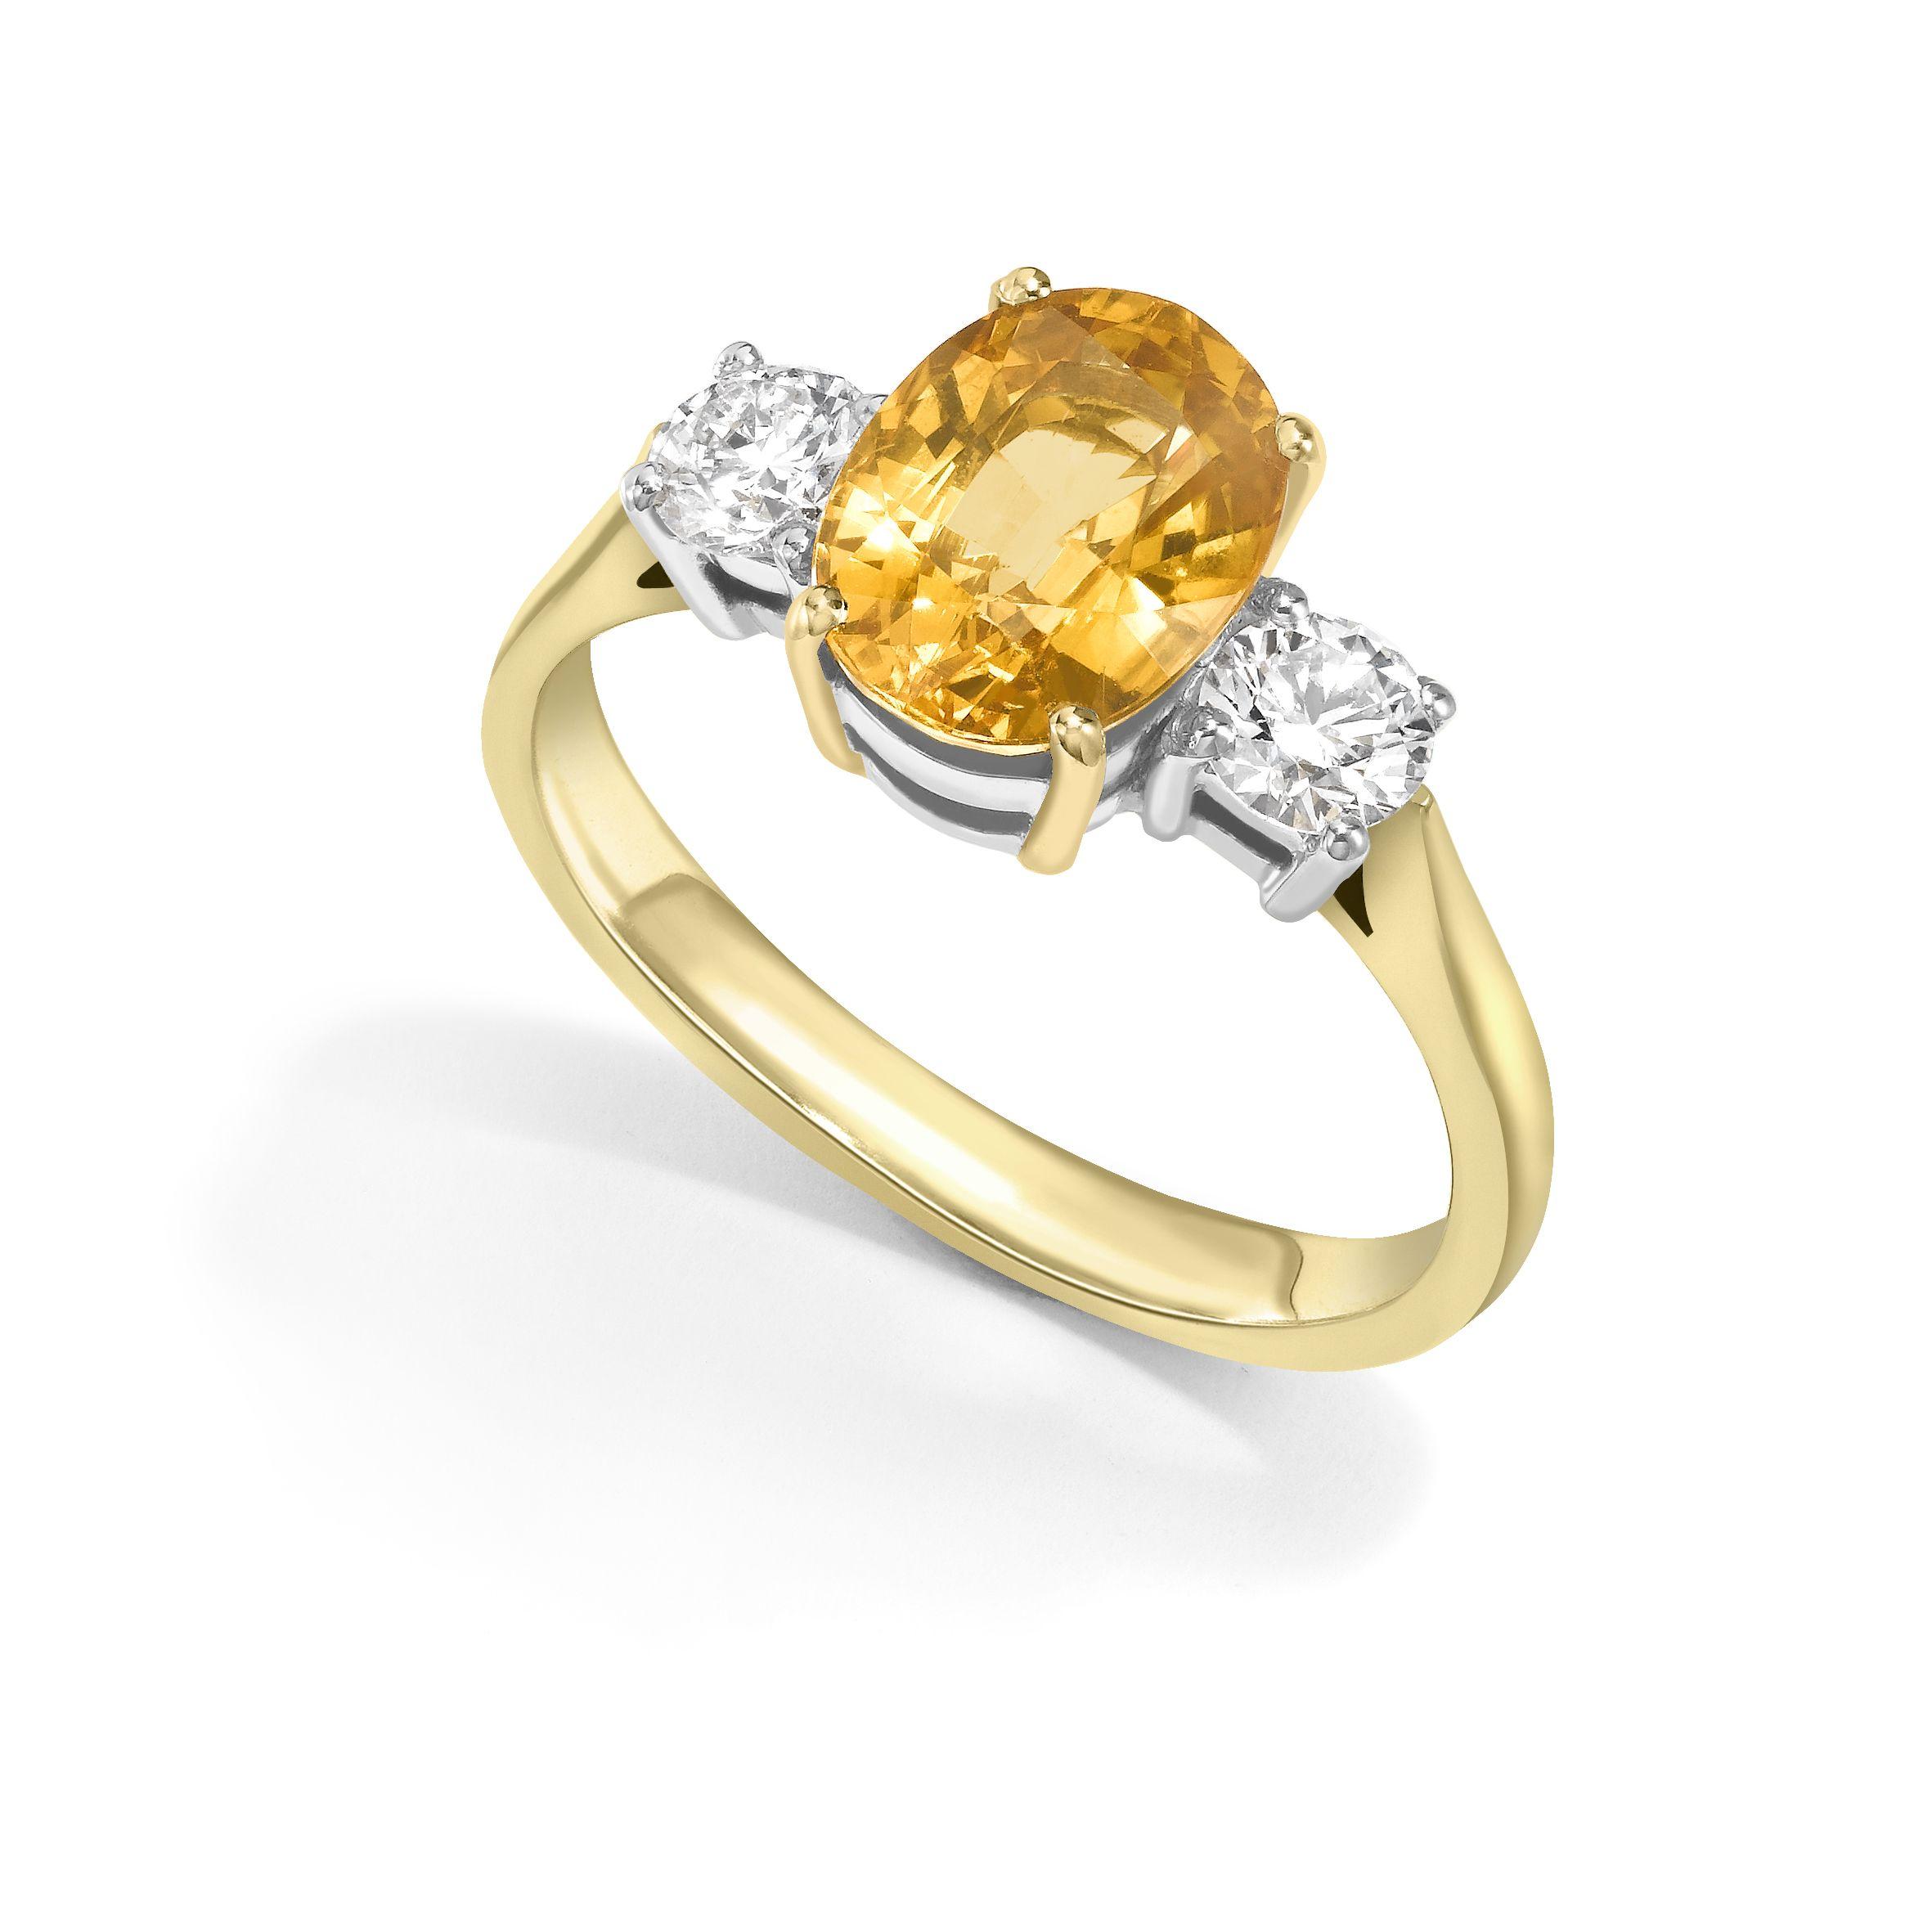 P J Watson Fine diamond jewelry, Jewelry, Jewellery uk